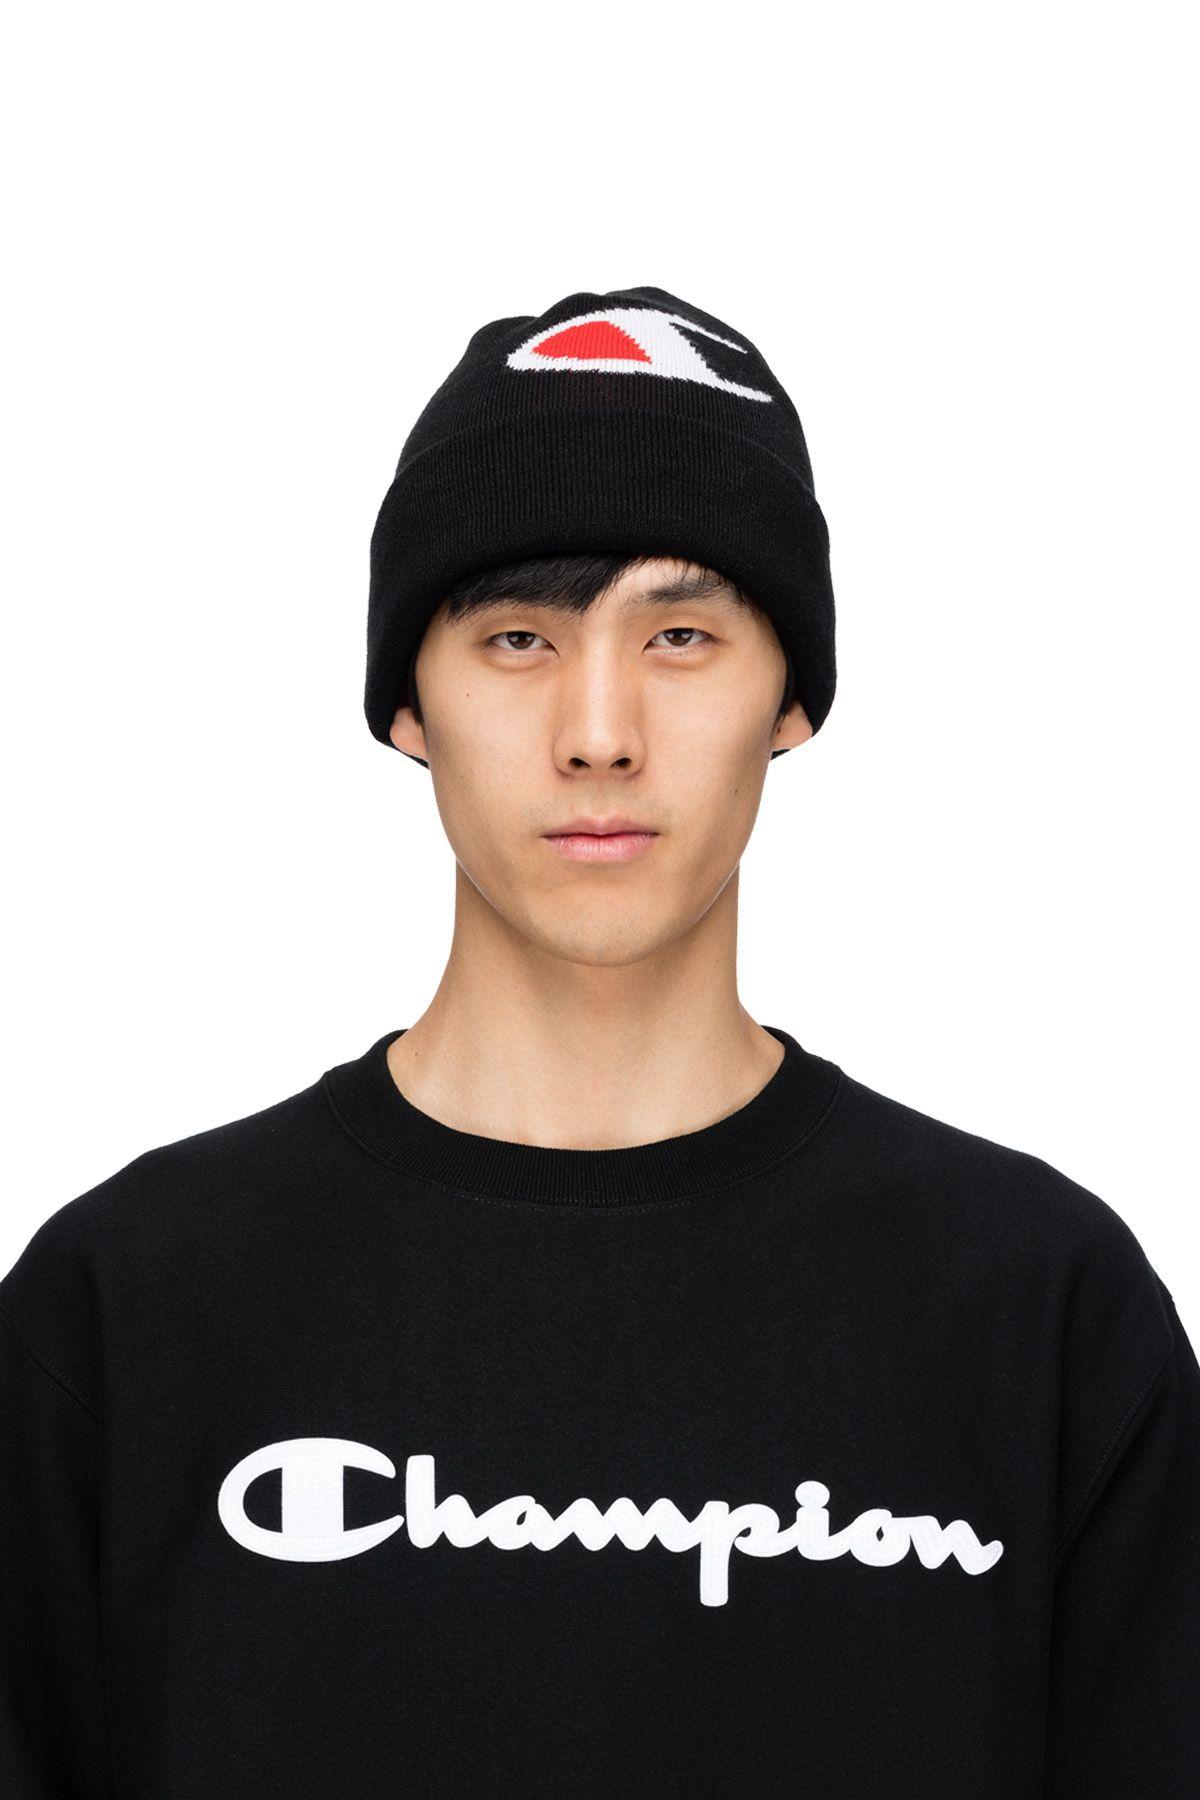 90b81e63d4190 Champion - C Knit Beanie - Black